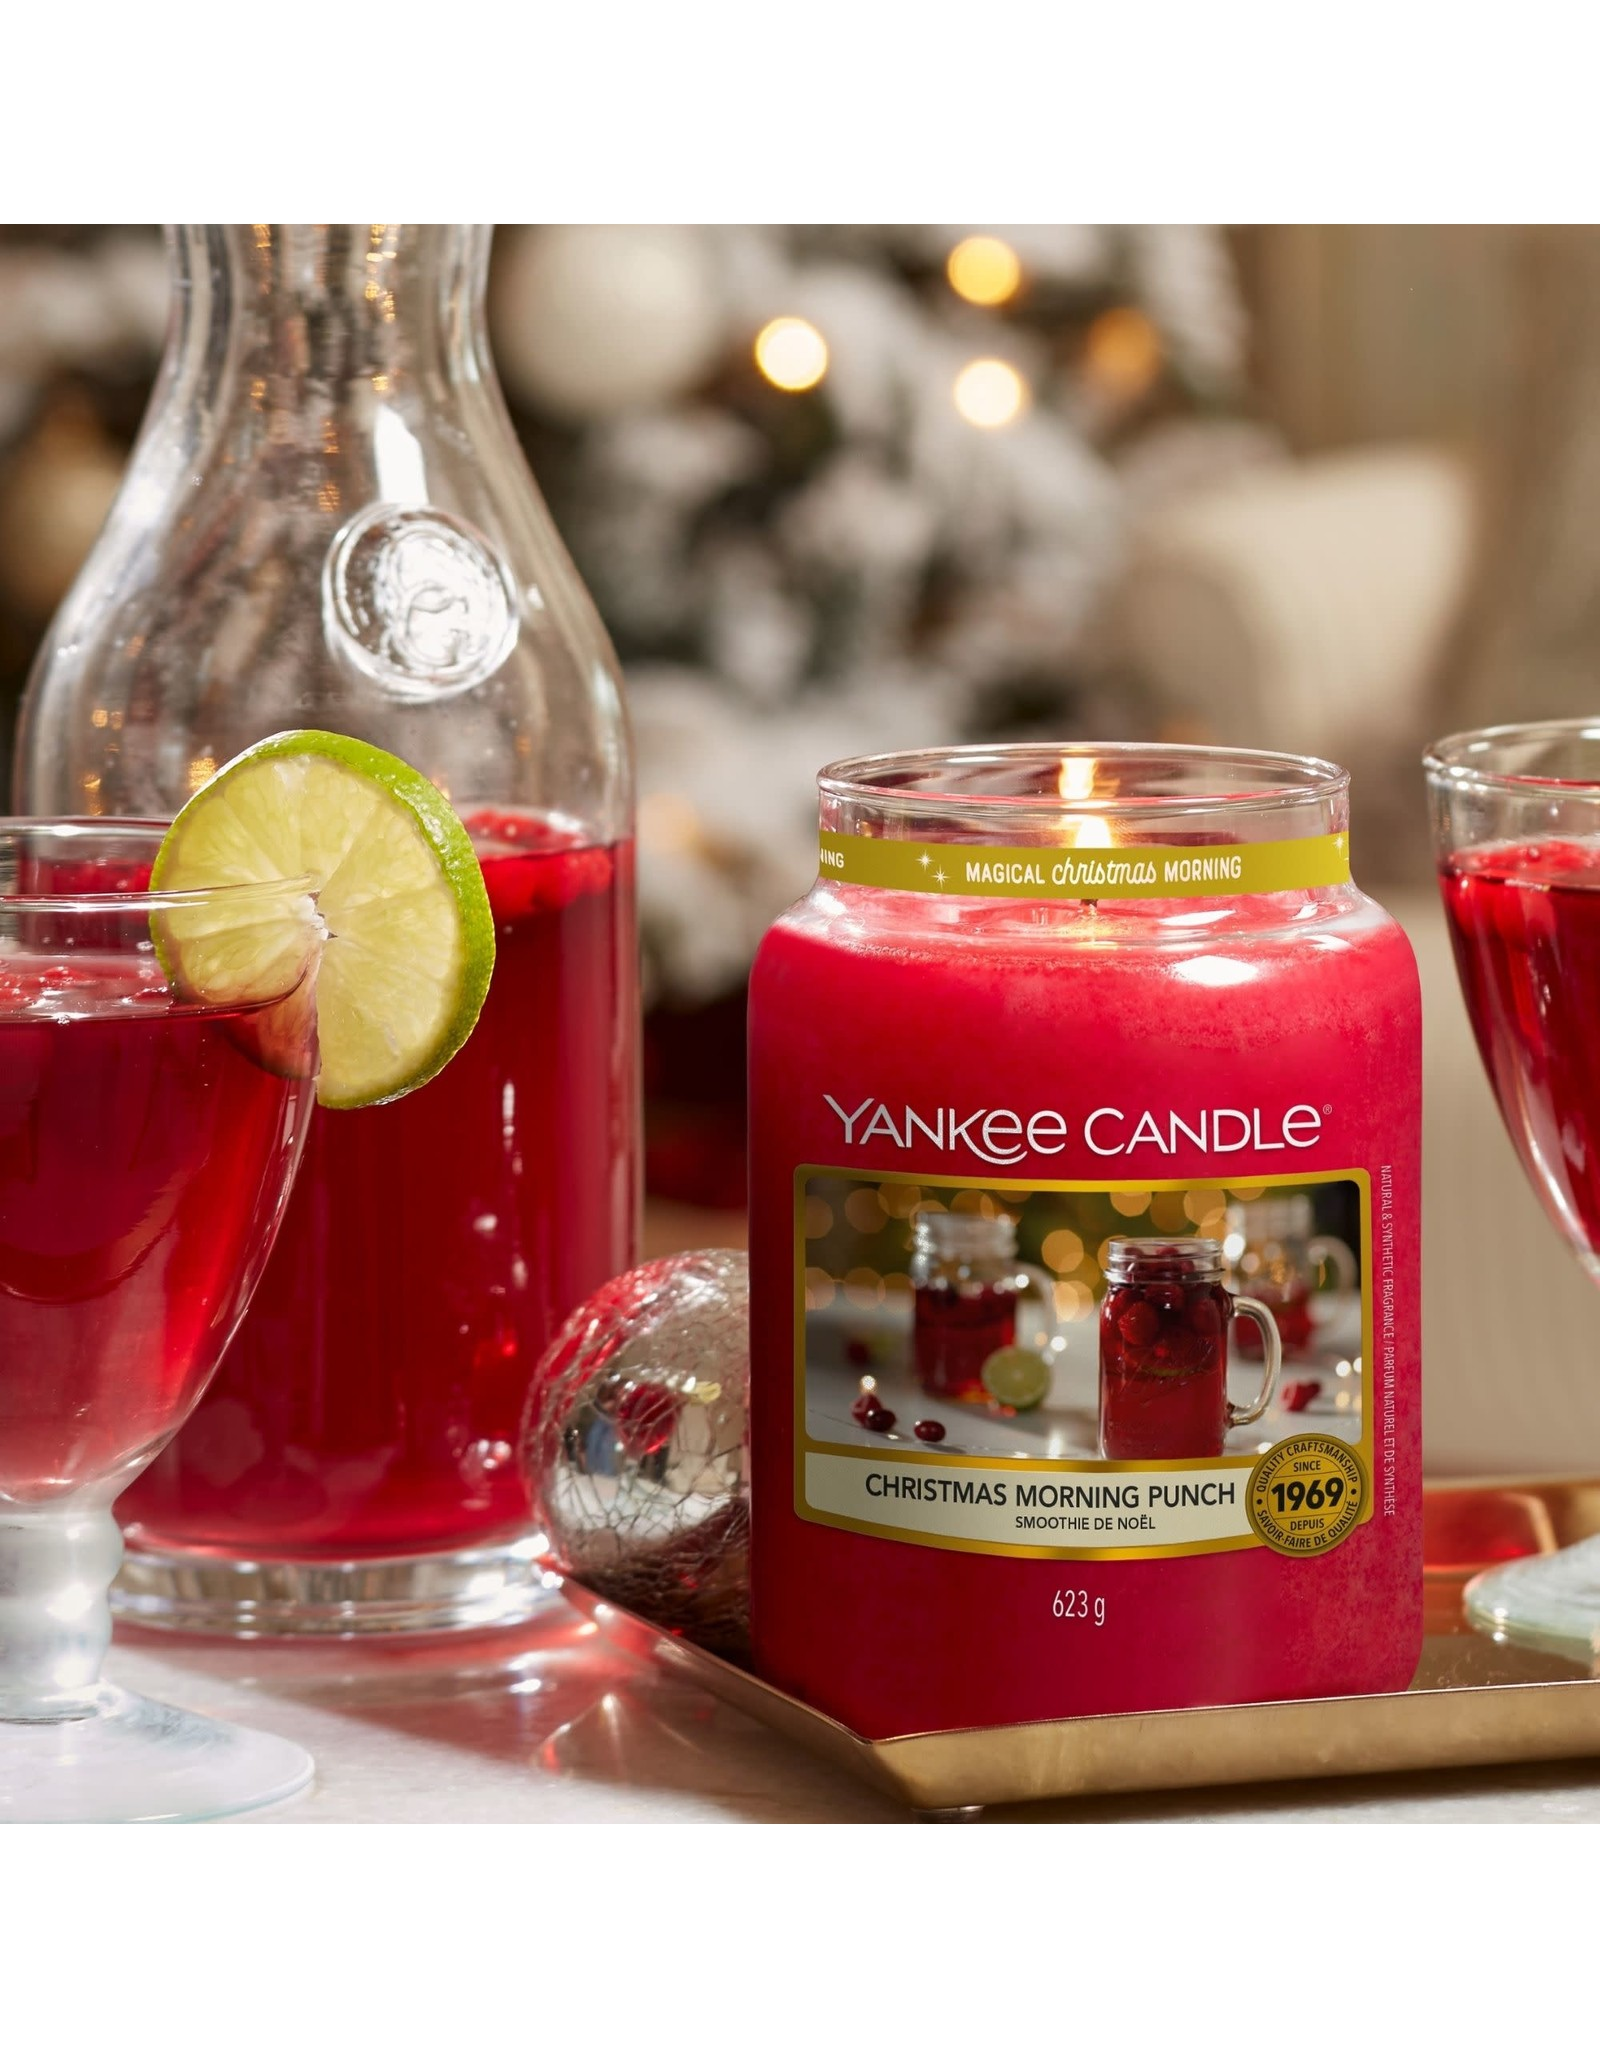 Yankee Candle Christmas Morning Punch - Large Jar